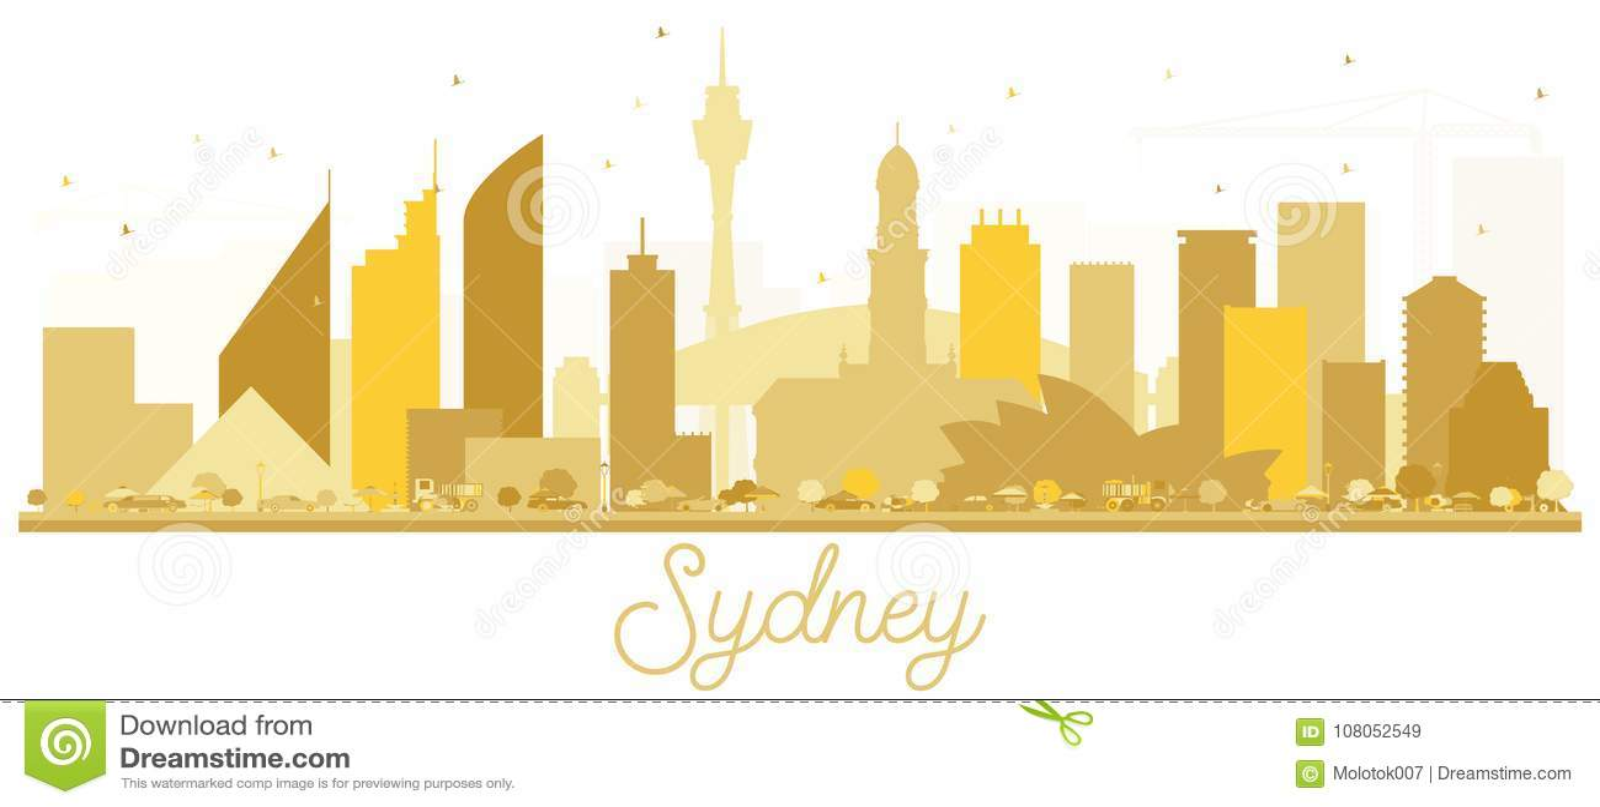 Fiu orientation dates in Sydney